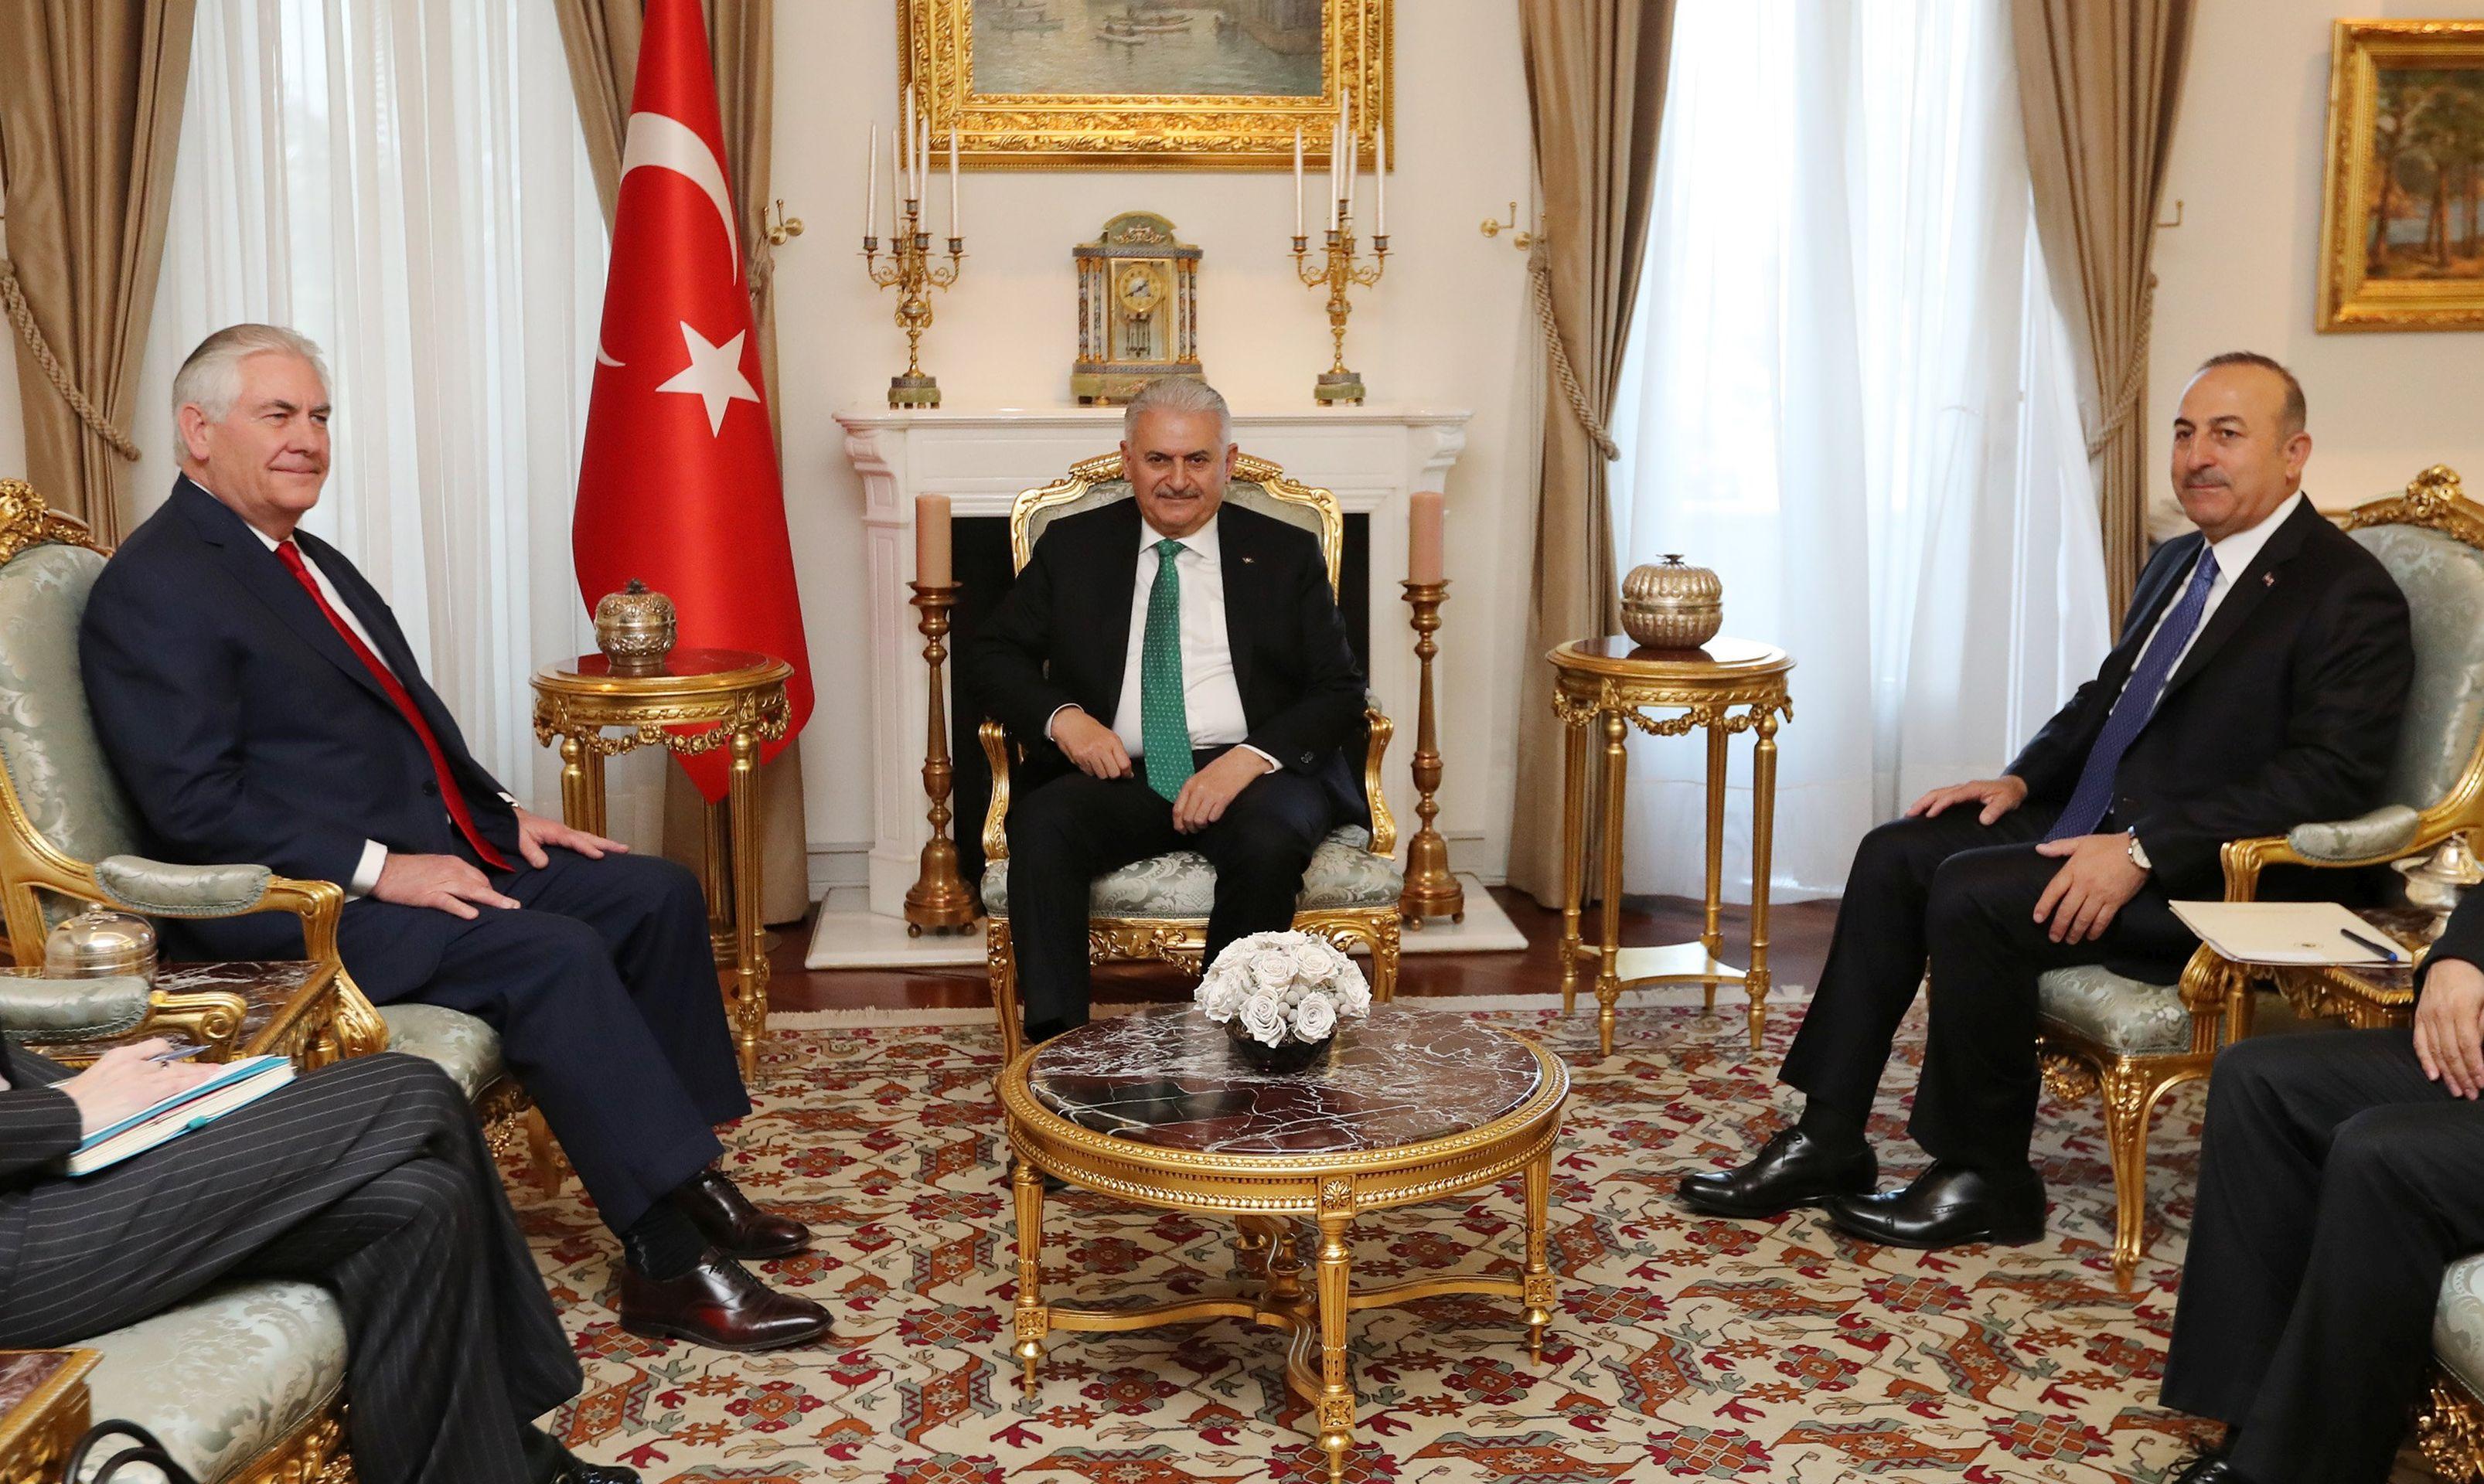 CAVUSOGLU TILLERSONU 'Turska očekuje konkretne poteze glede izručenja Gulena'